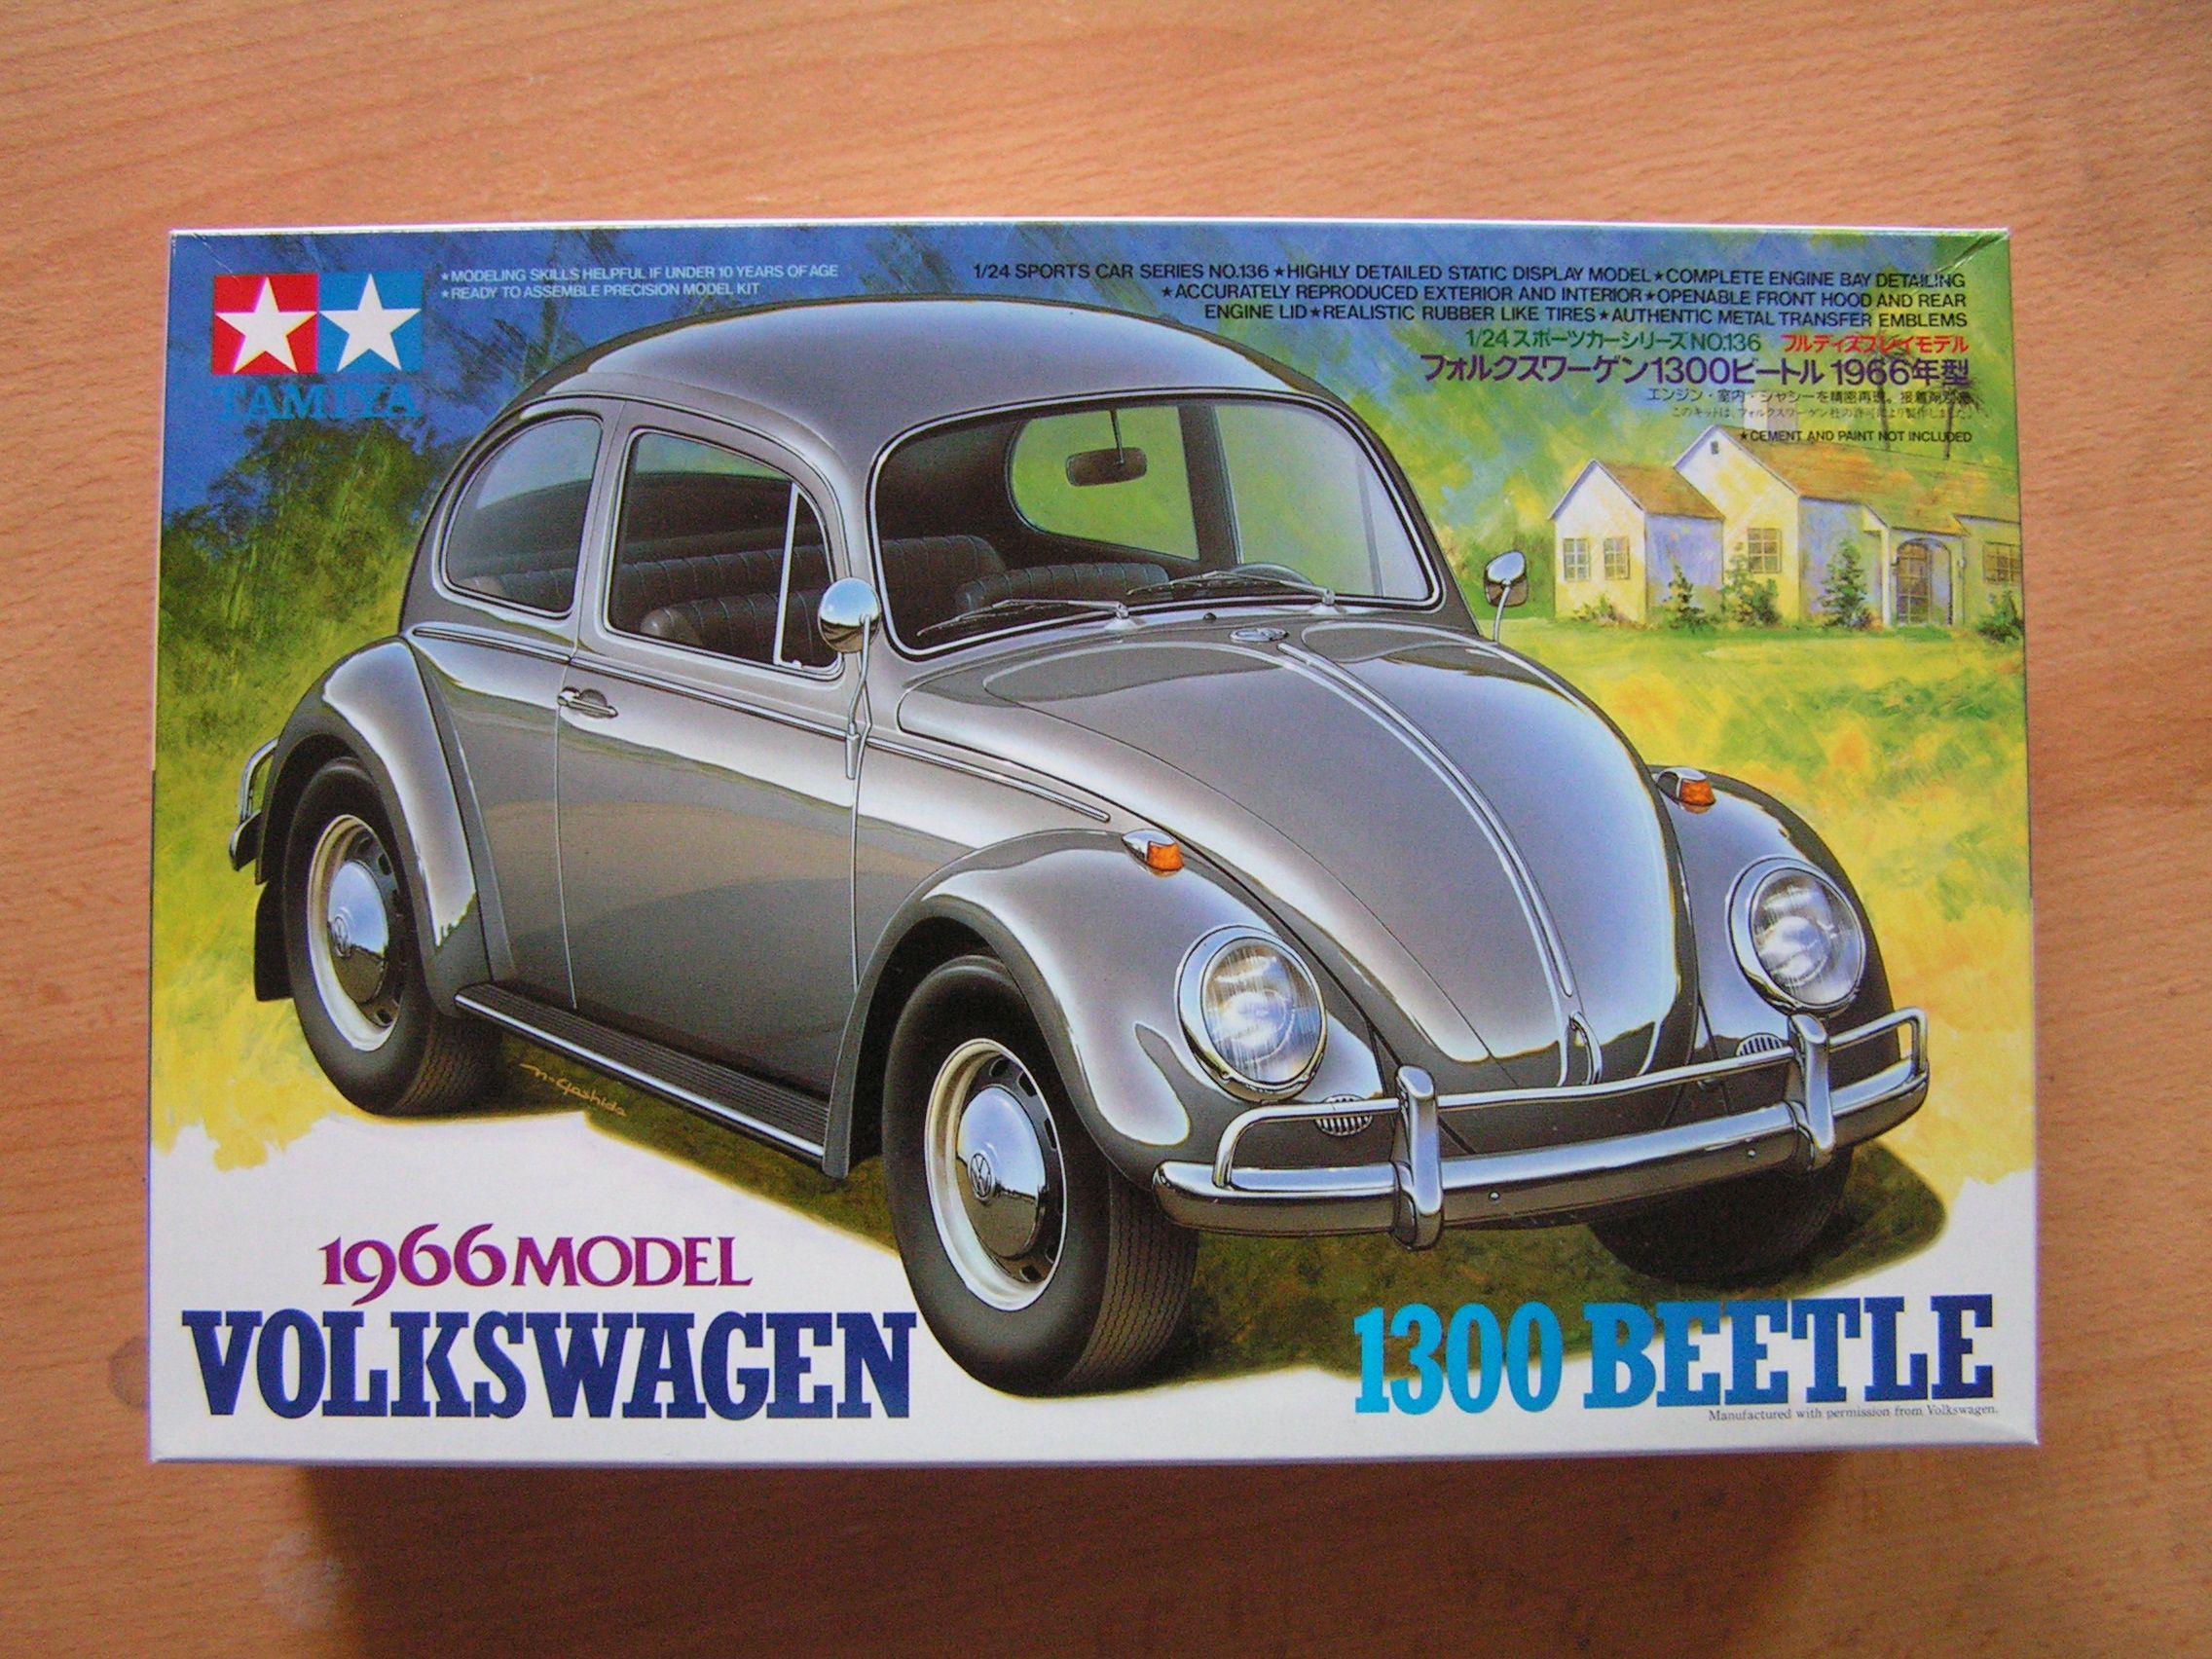 tamiya volkswagen beetle - Google Search | Model Kit Box Art ...